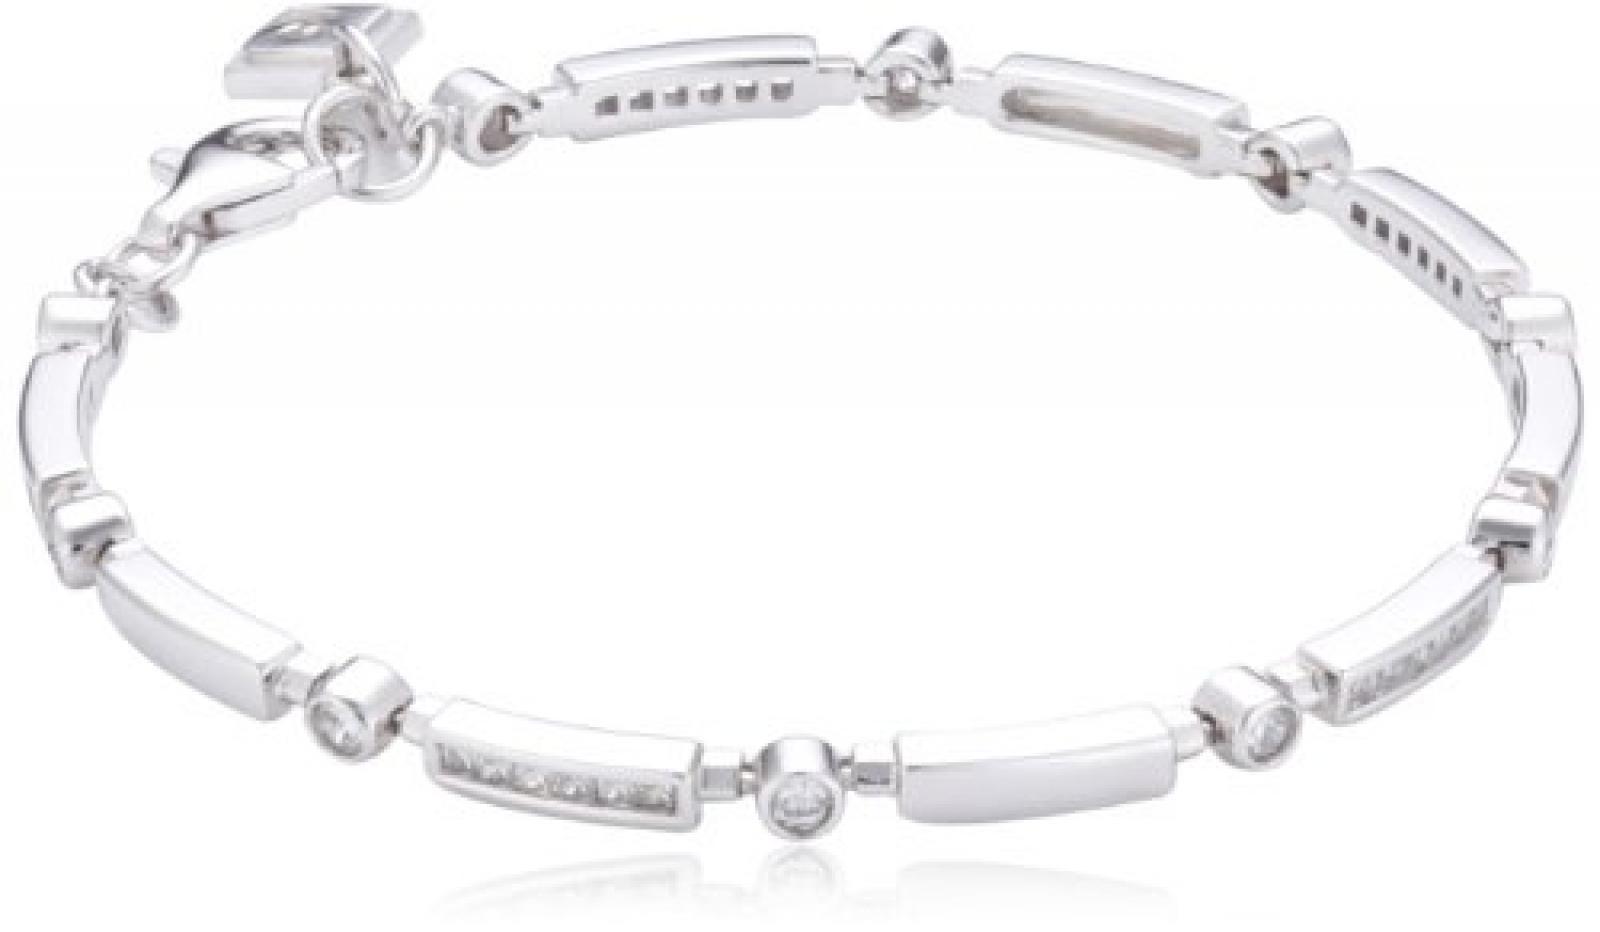 Pierre Cardin Damen Armband 925 Sterling Silber rhodiniert Kristall Zirkonia Cascade 19 cm weiß PCBR90120A190